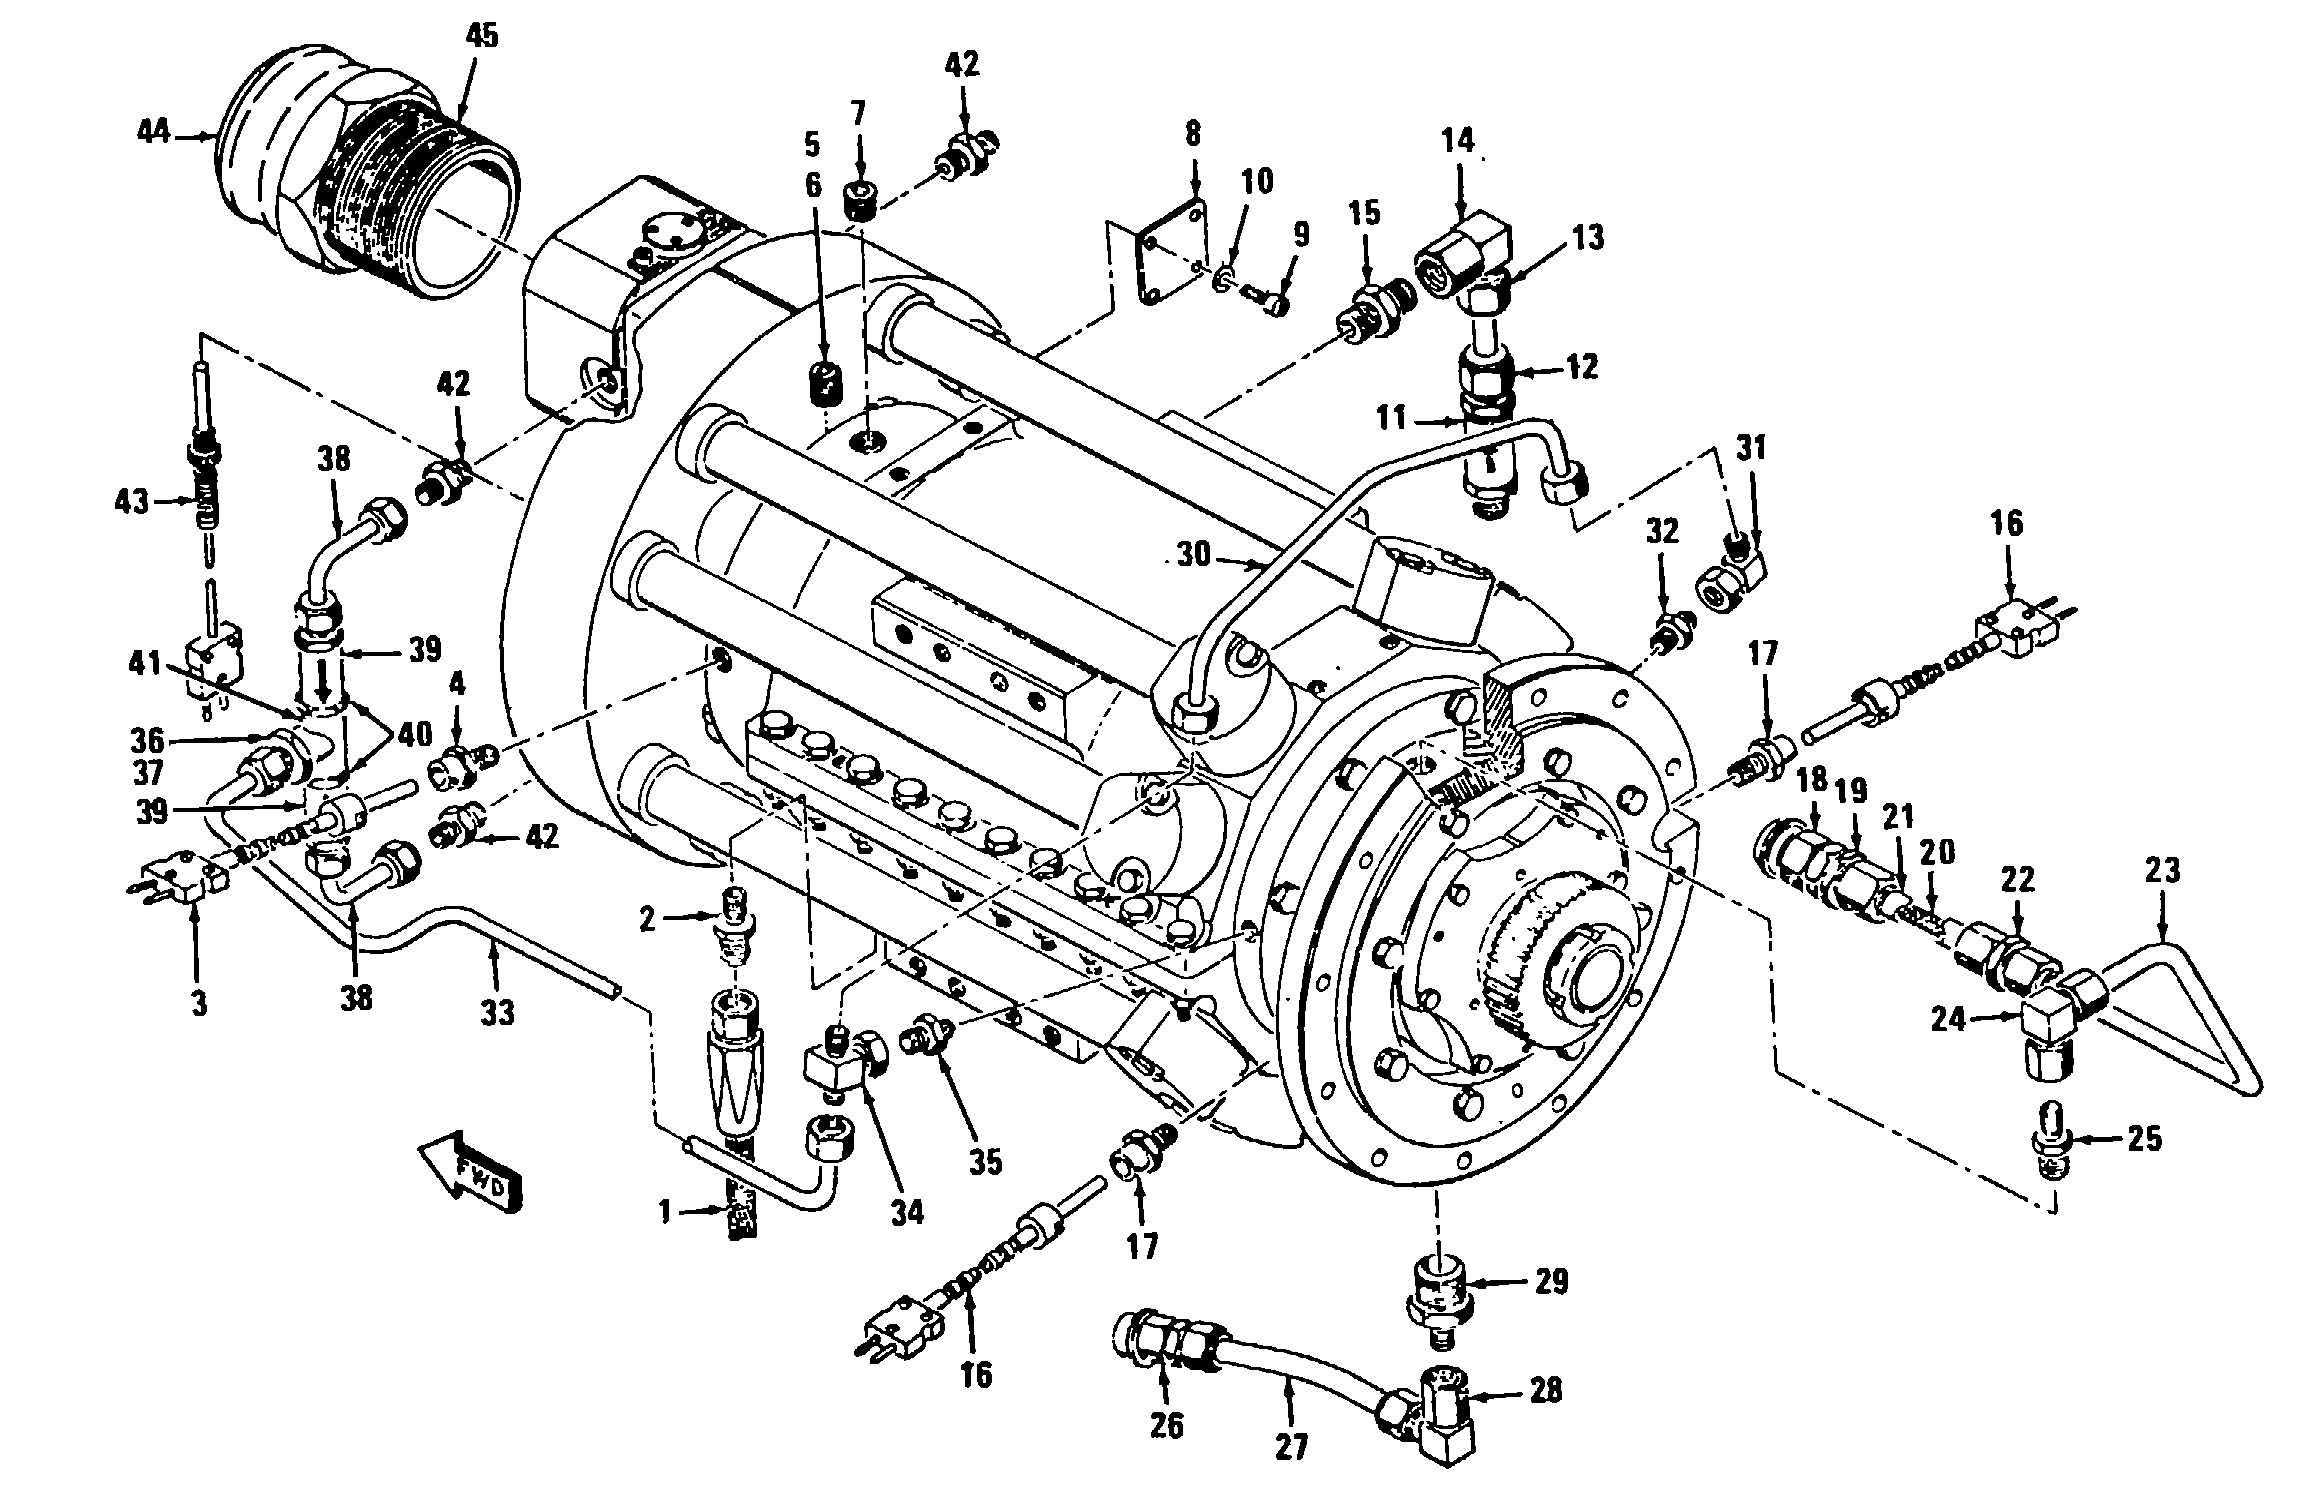 T55 Turboshaft Power Absorption System Maintenance